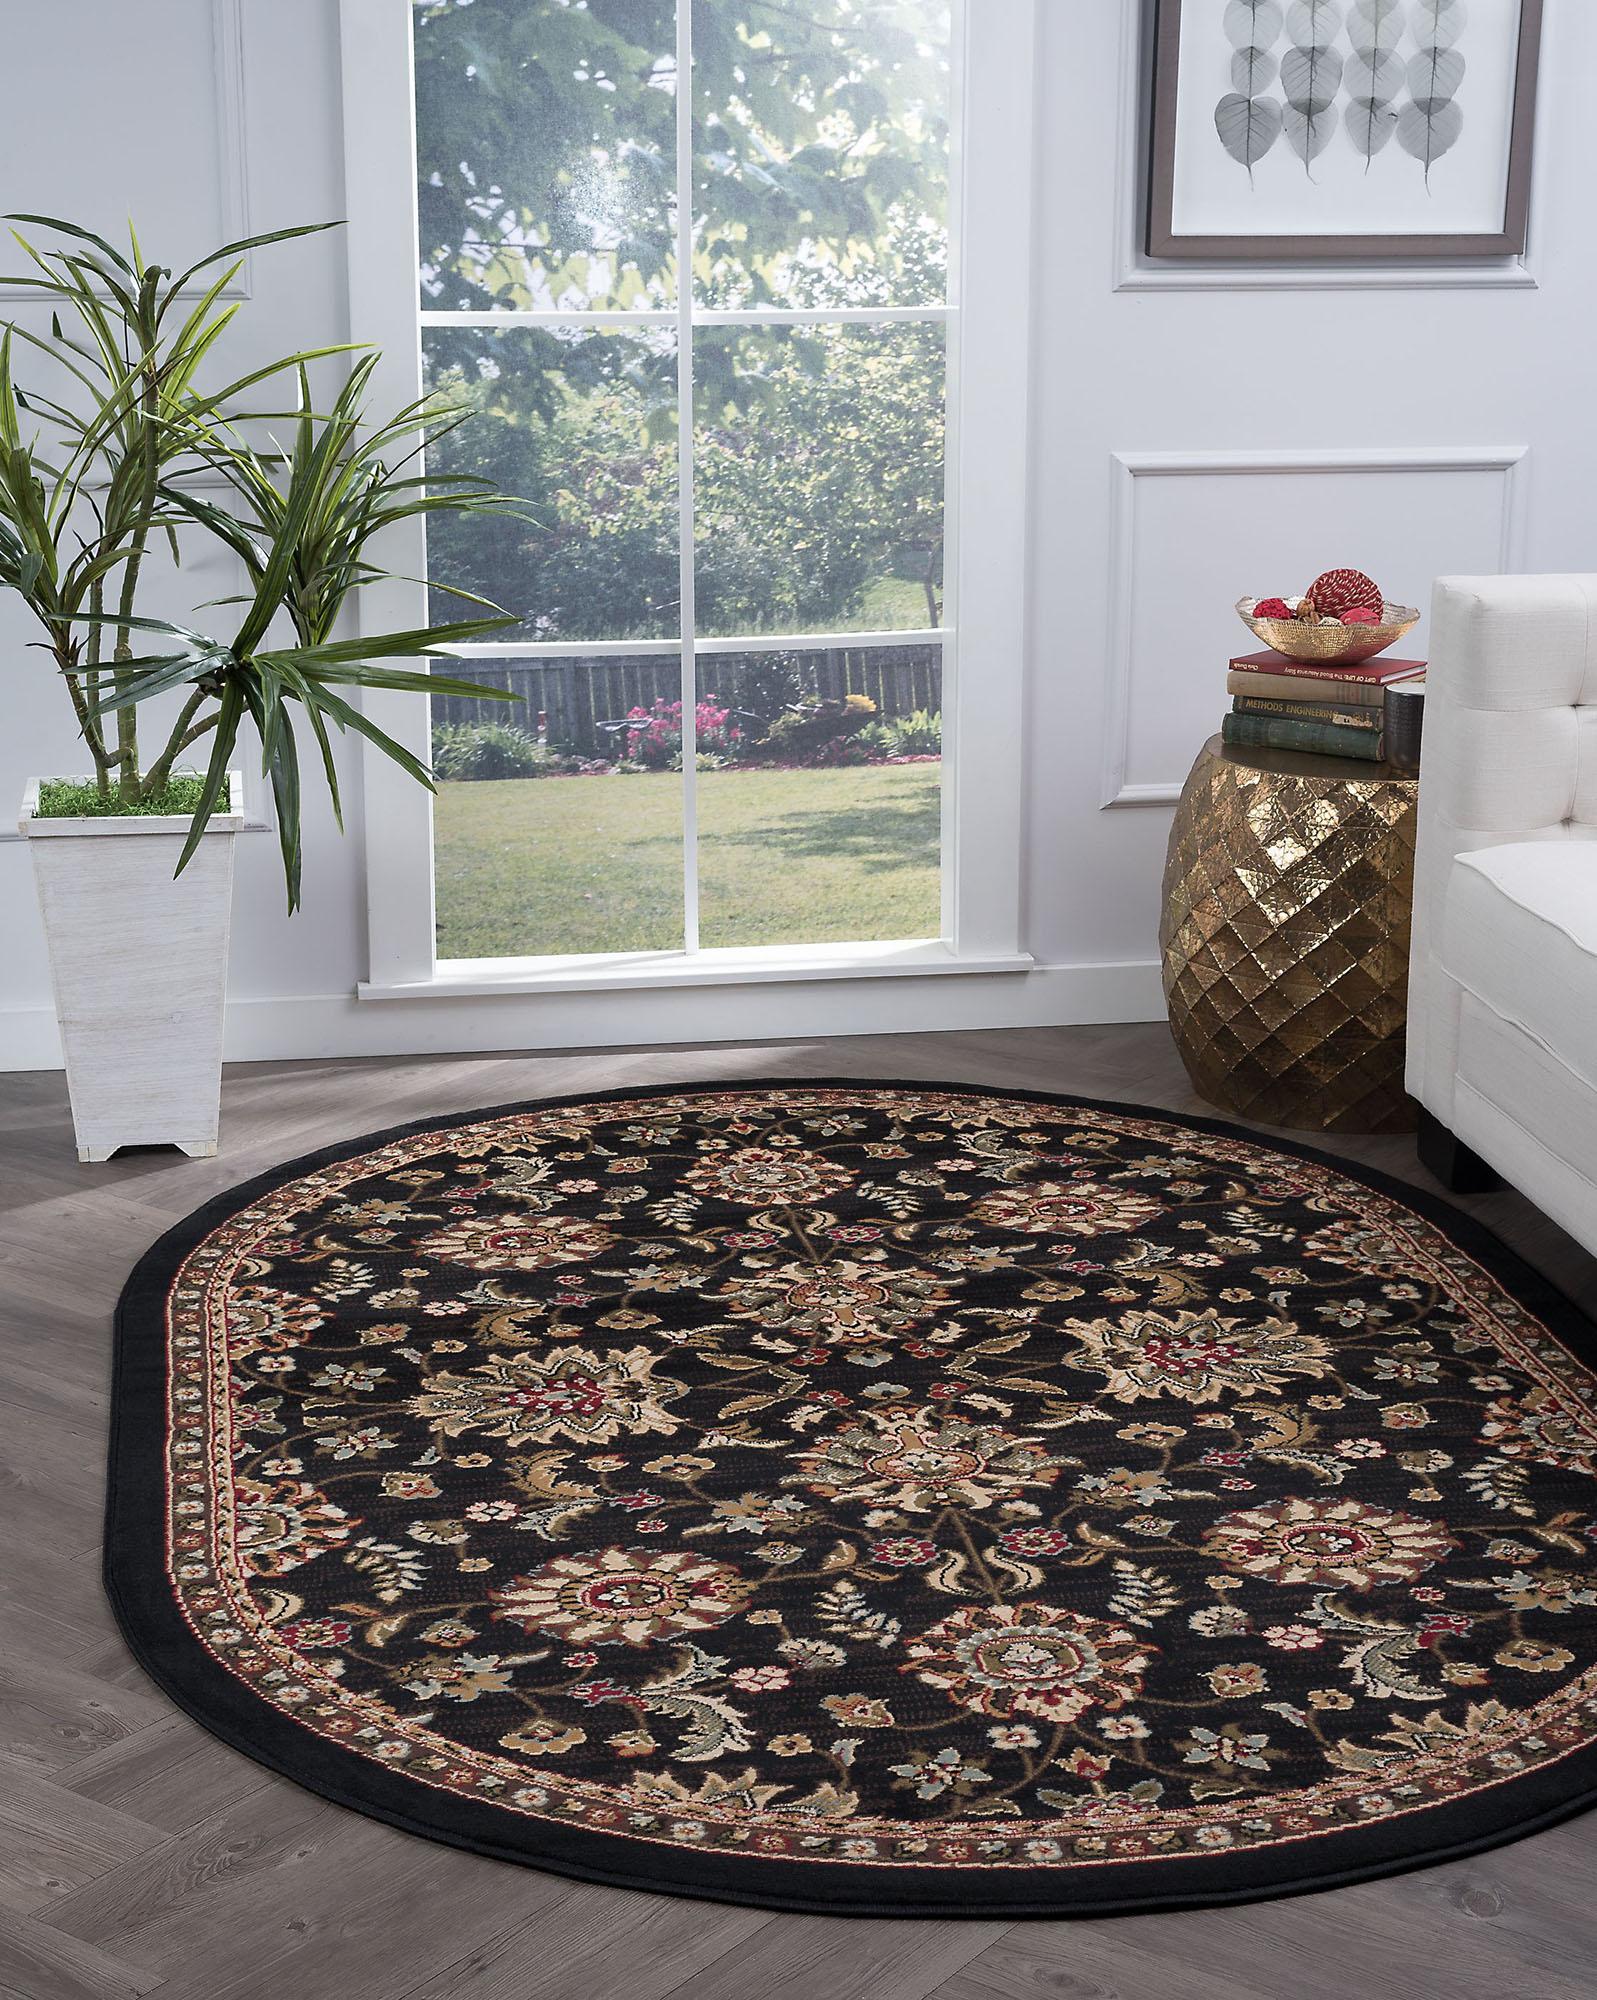 Gray Oriental Border 6' Oval Area Rug Leaf Persien Carpet: A